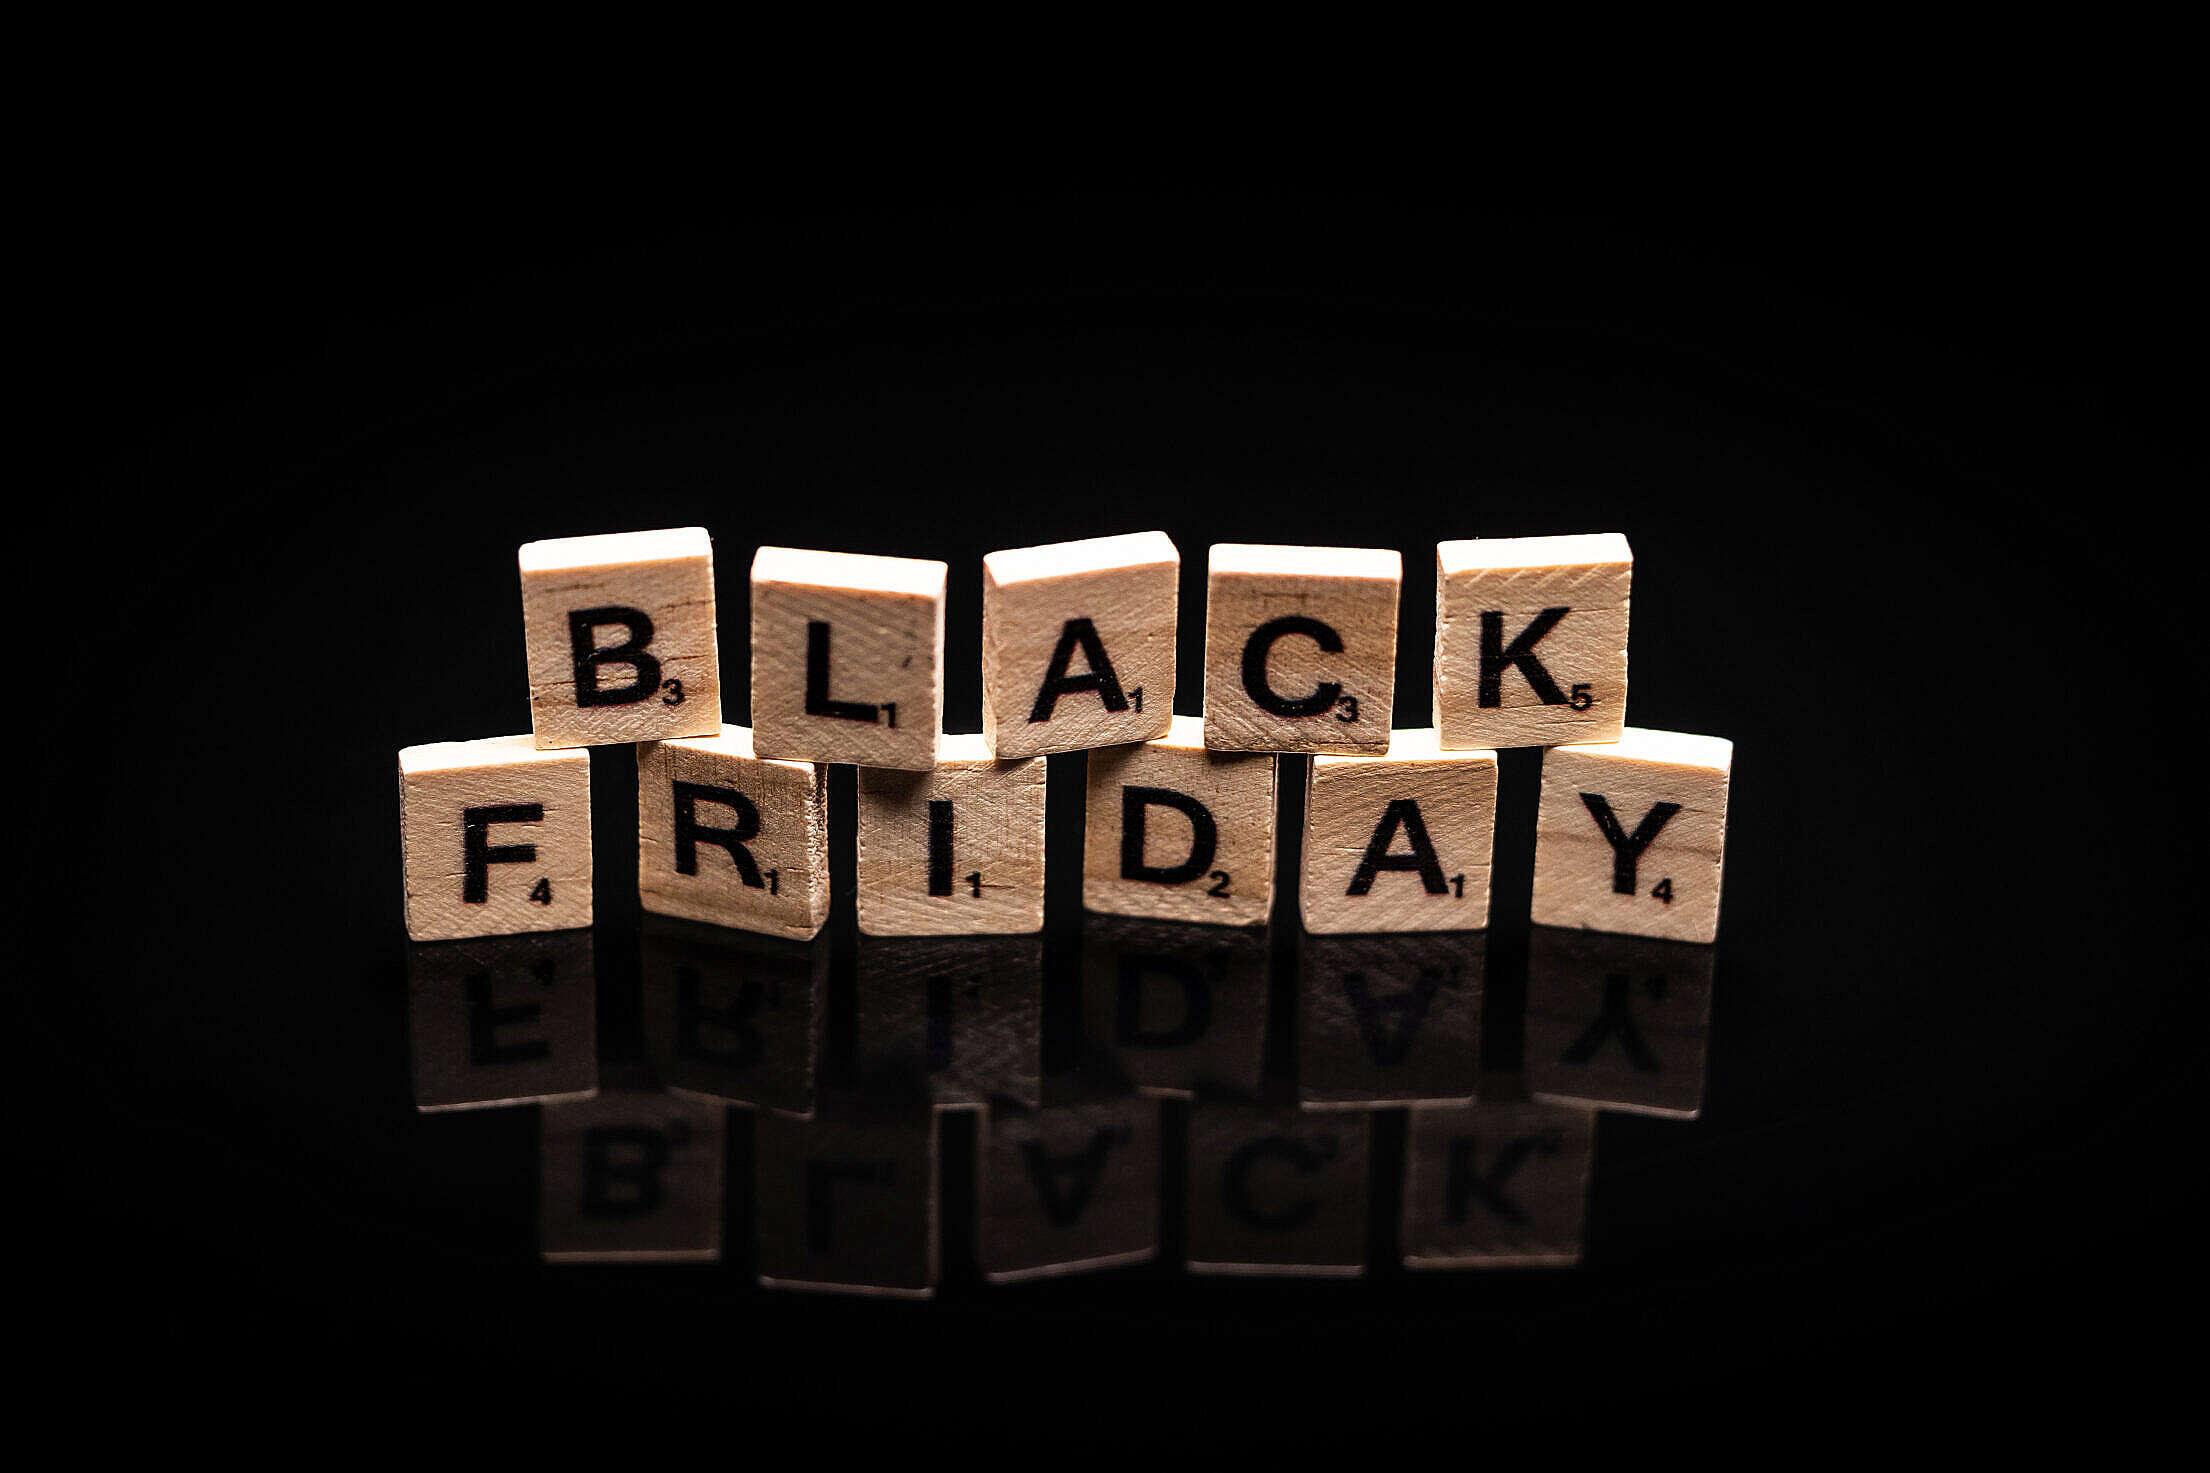 Black Friday Free Stock Photo